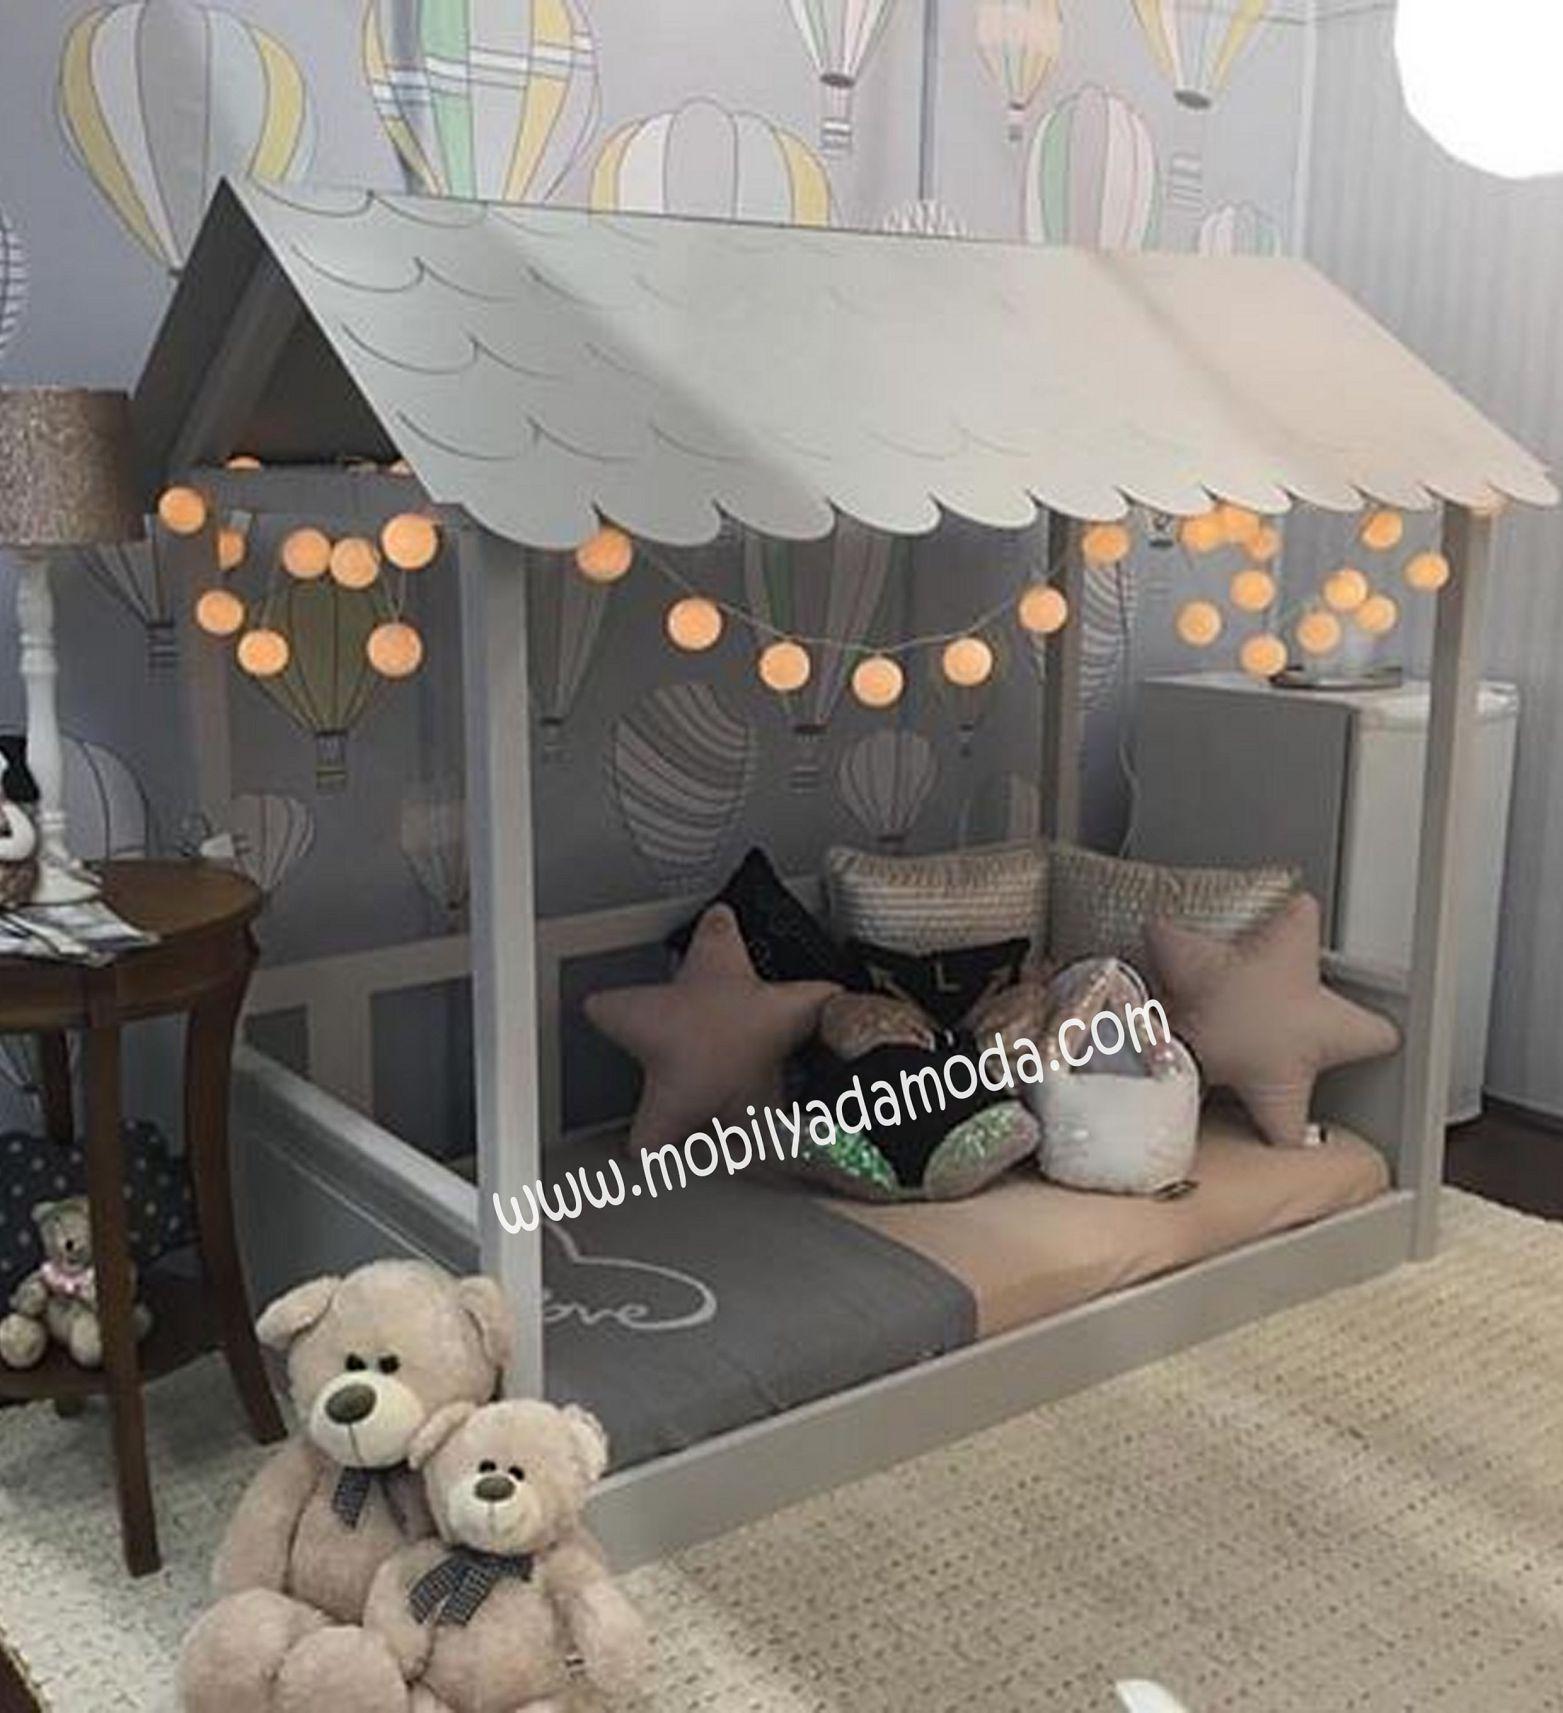 55 Best Boys Rooms Images On Pinterest: 55 Best Montessori Bedroom Design For Happy Kids 004